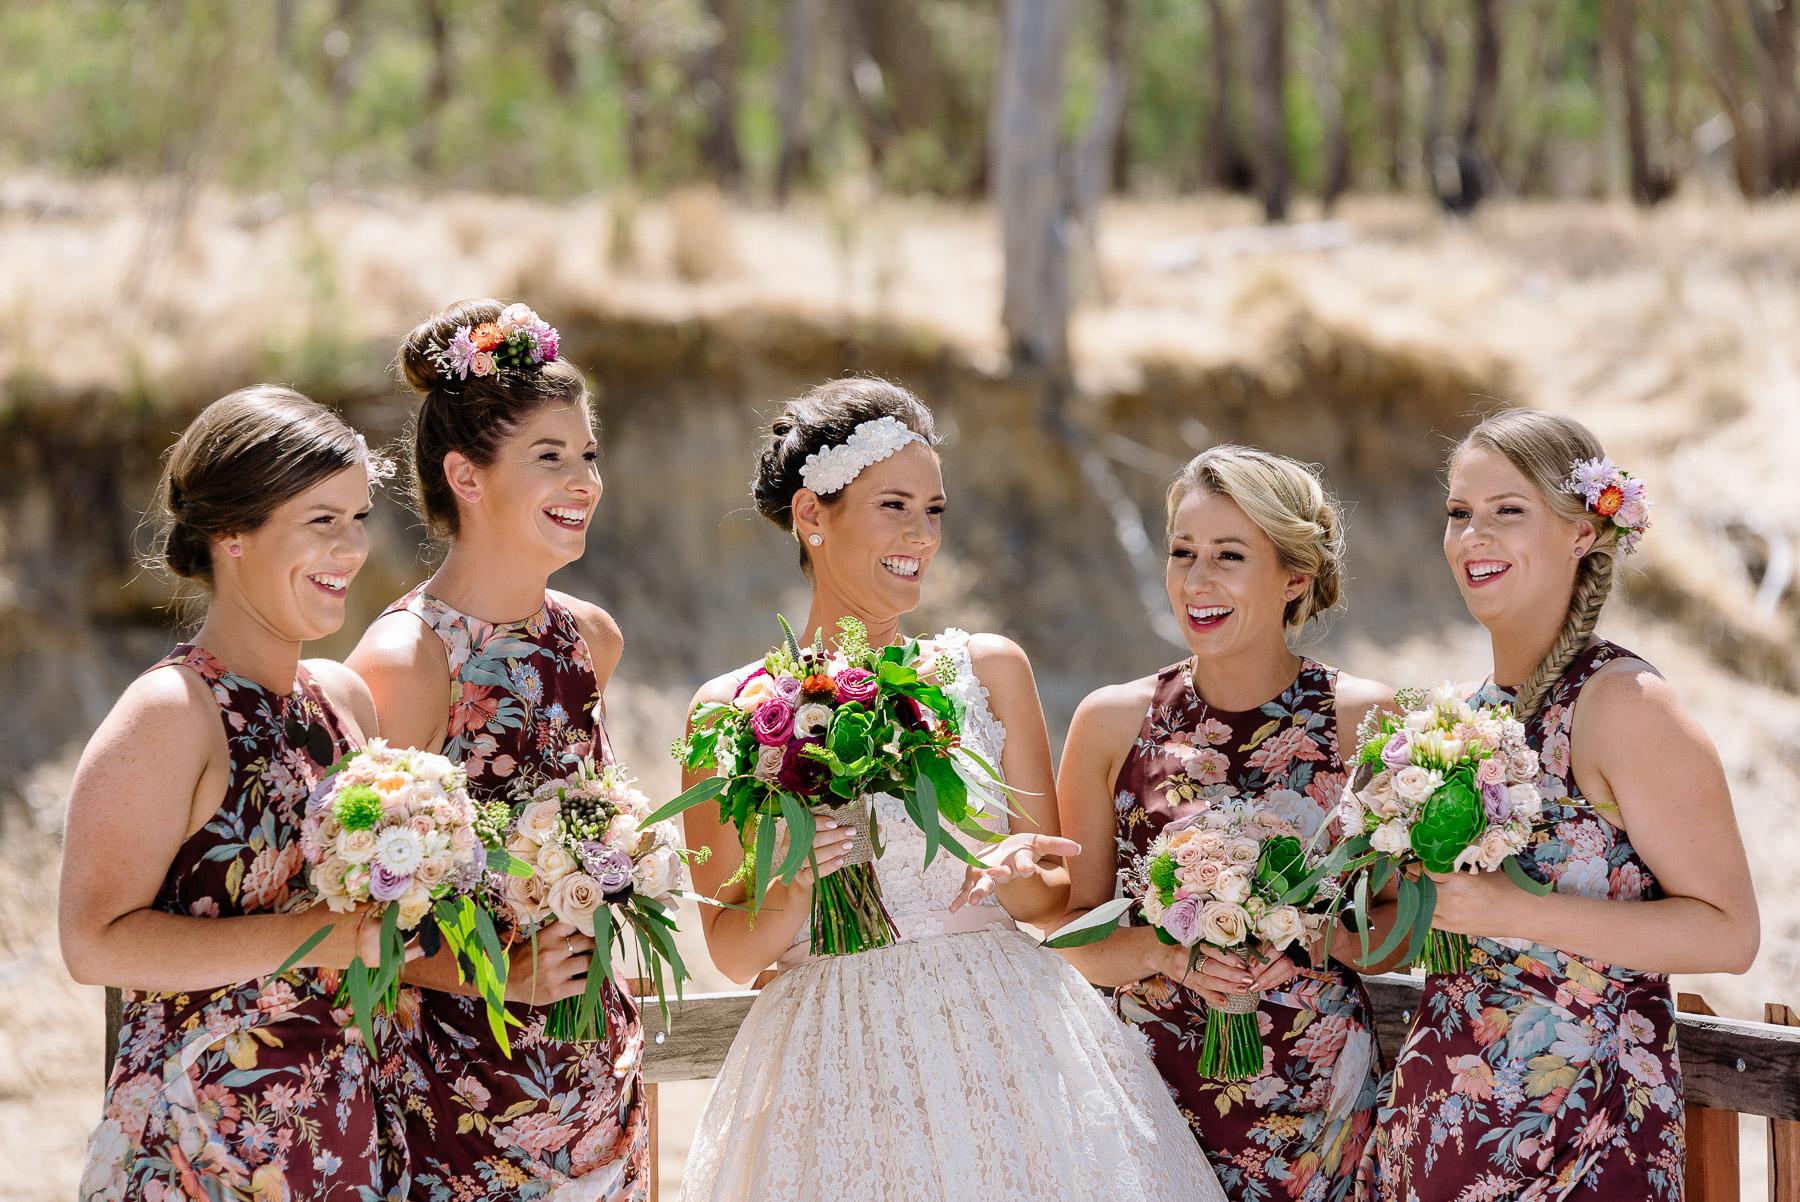 Melissa_and_Kristan_Echuca_Farm_Wedding_New_Years_Eve-14.jpg